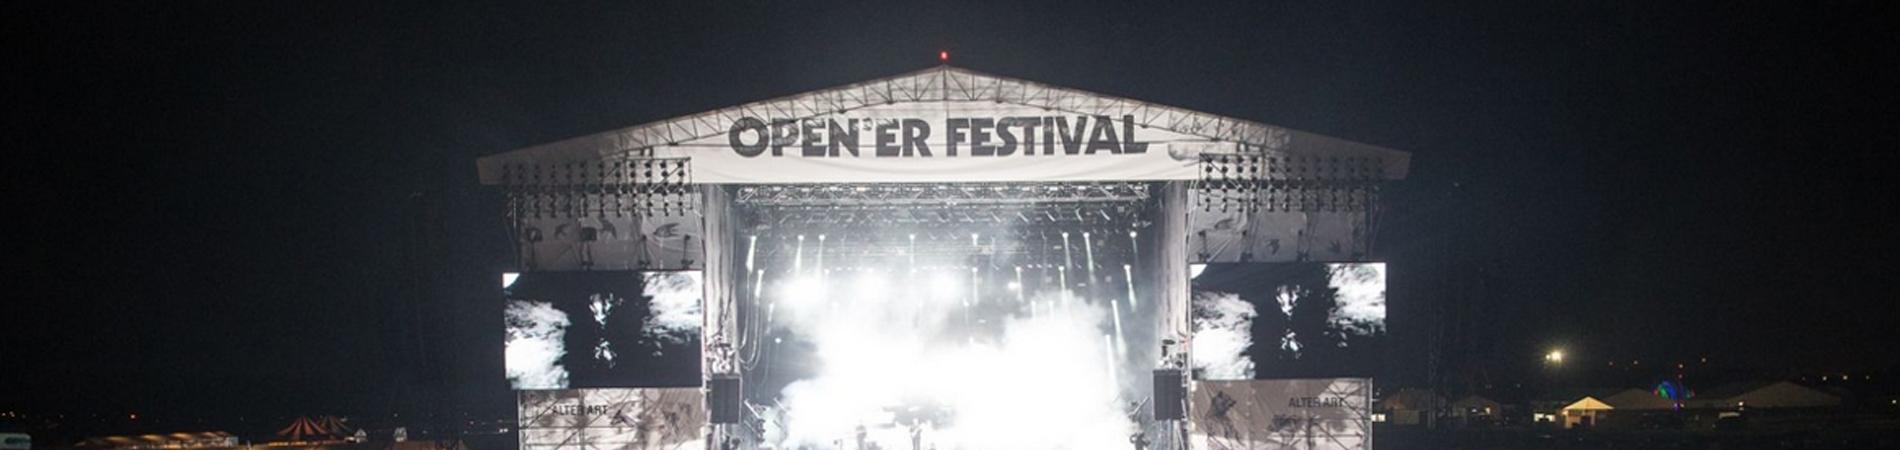 Festiwale muzyczne w Polsce 2018 - Orange Warsaw Festival 2018 line up. Open'er Festival 2018 line up. Kraków Live Festival 2018 line up.